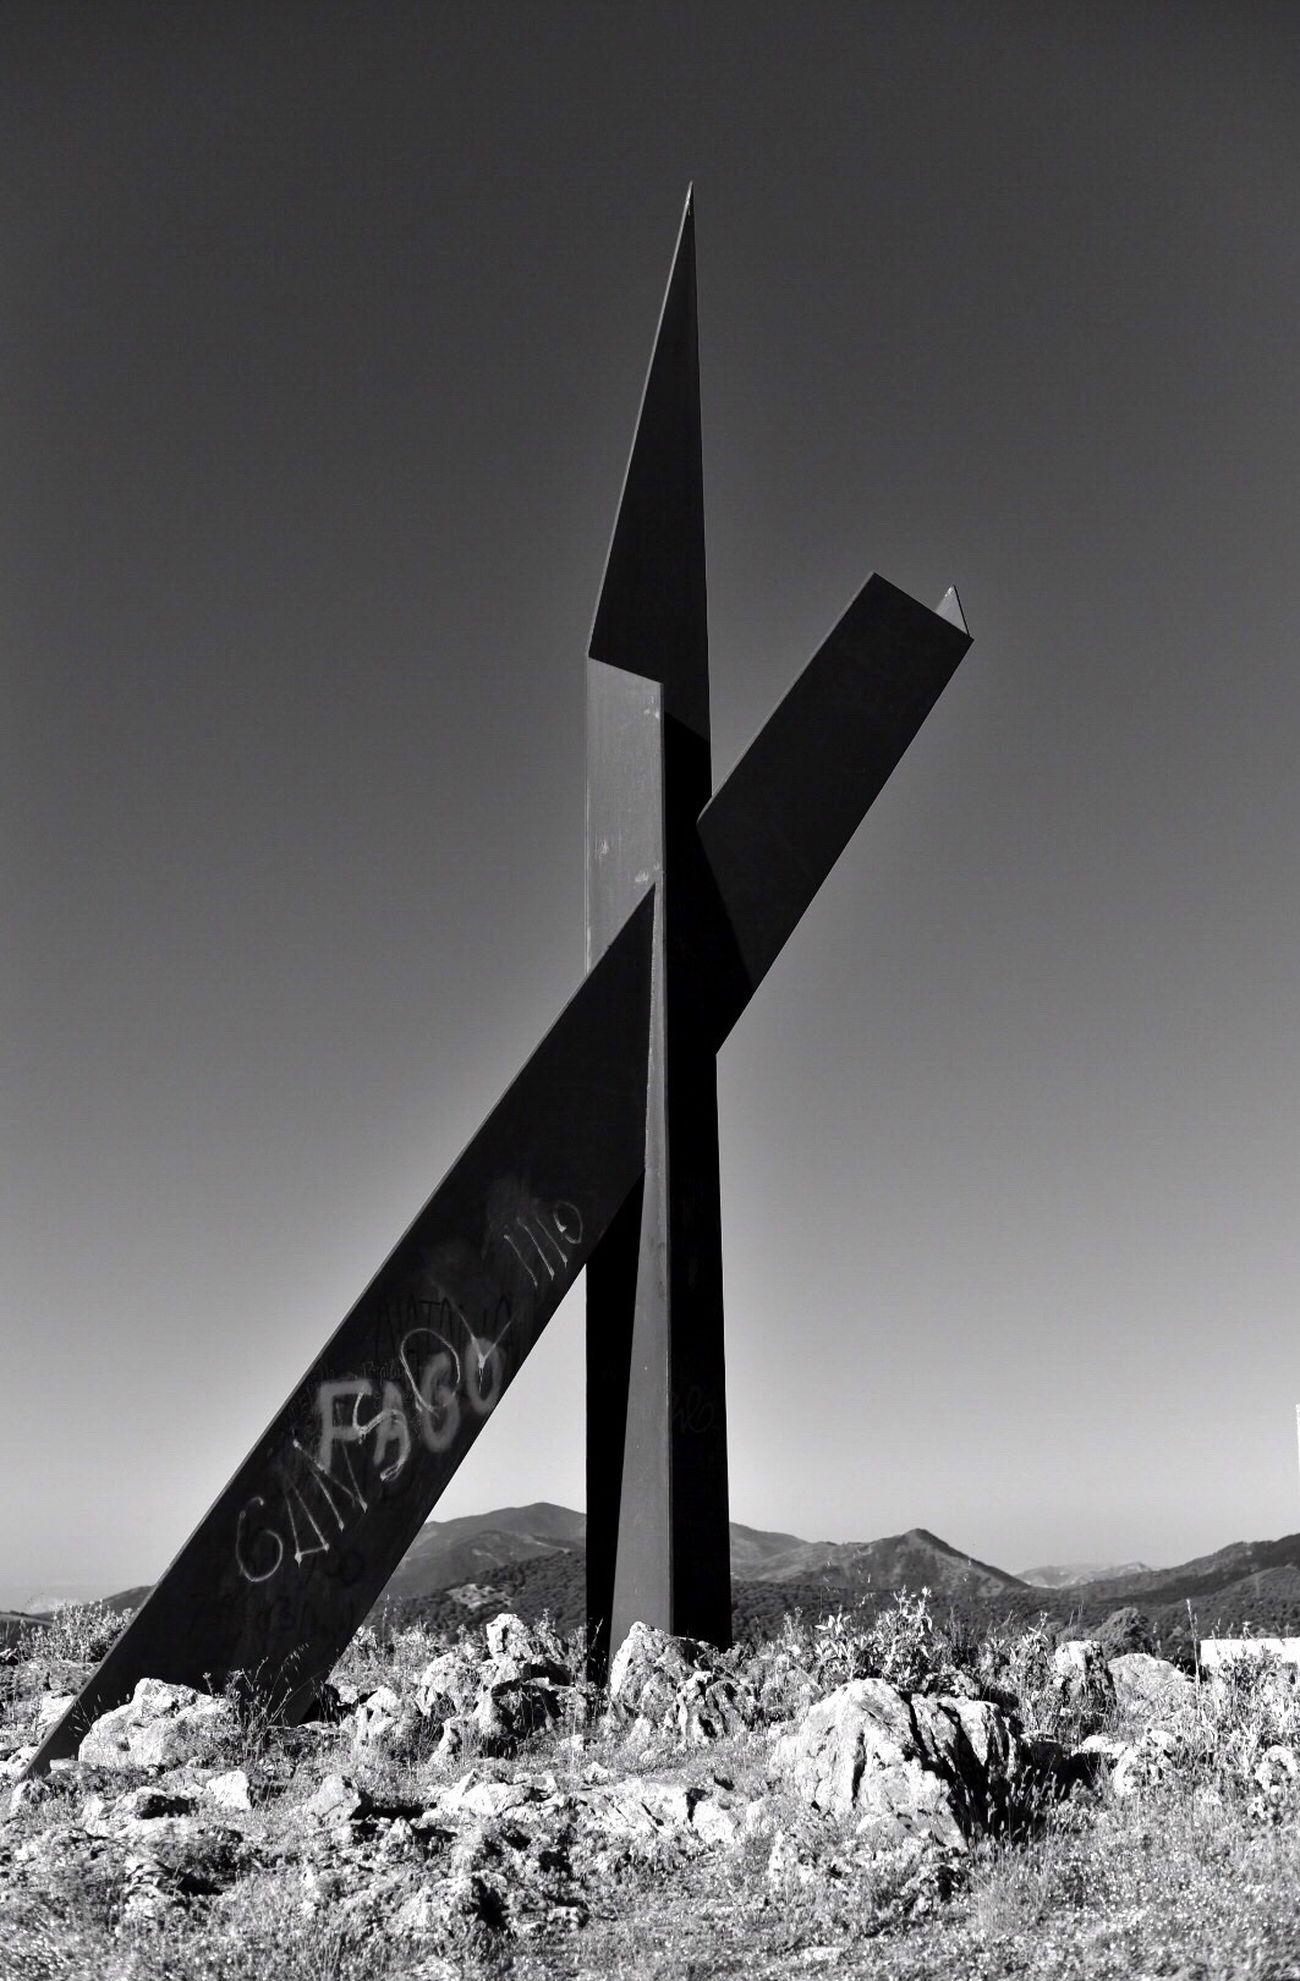 Huge Spanish Civil War Memorial Sunday Morning Memorial War War Memorial Andalucía SPAIN Sunday EyeEm Gallery Eyemphotography Blackandwhite